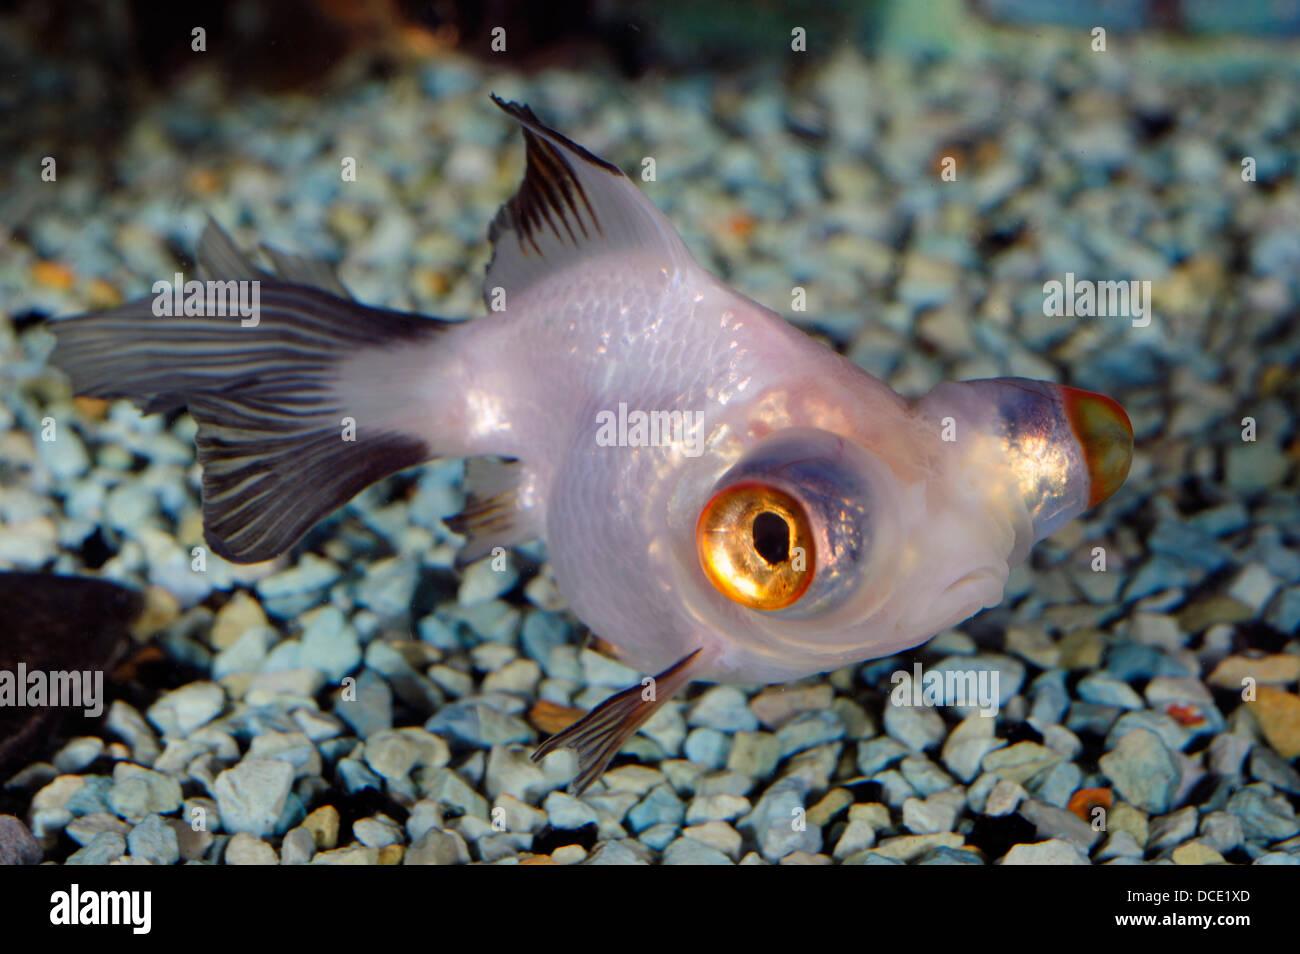 Telescope Eye Goldfish, Carassius auratus auratus 'Telescope Eye', Ciprinidae - Stock Image